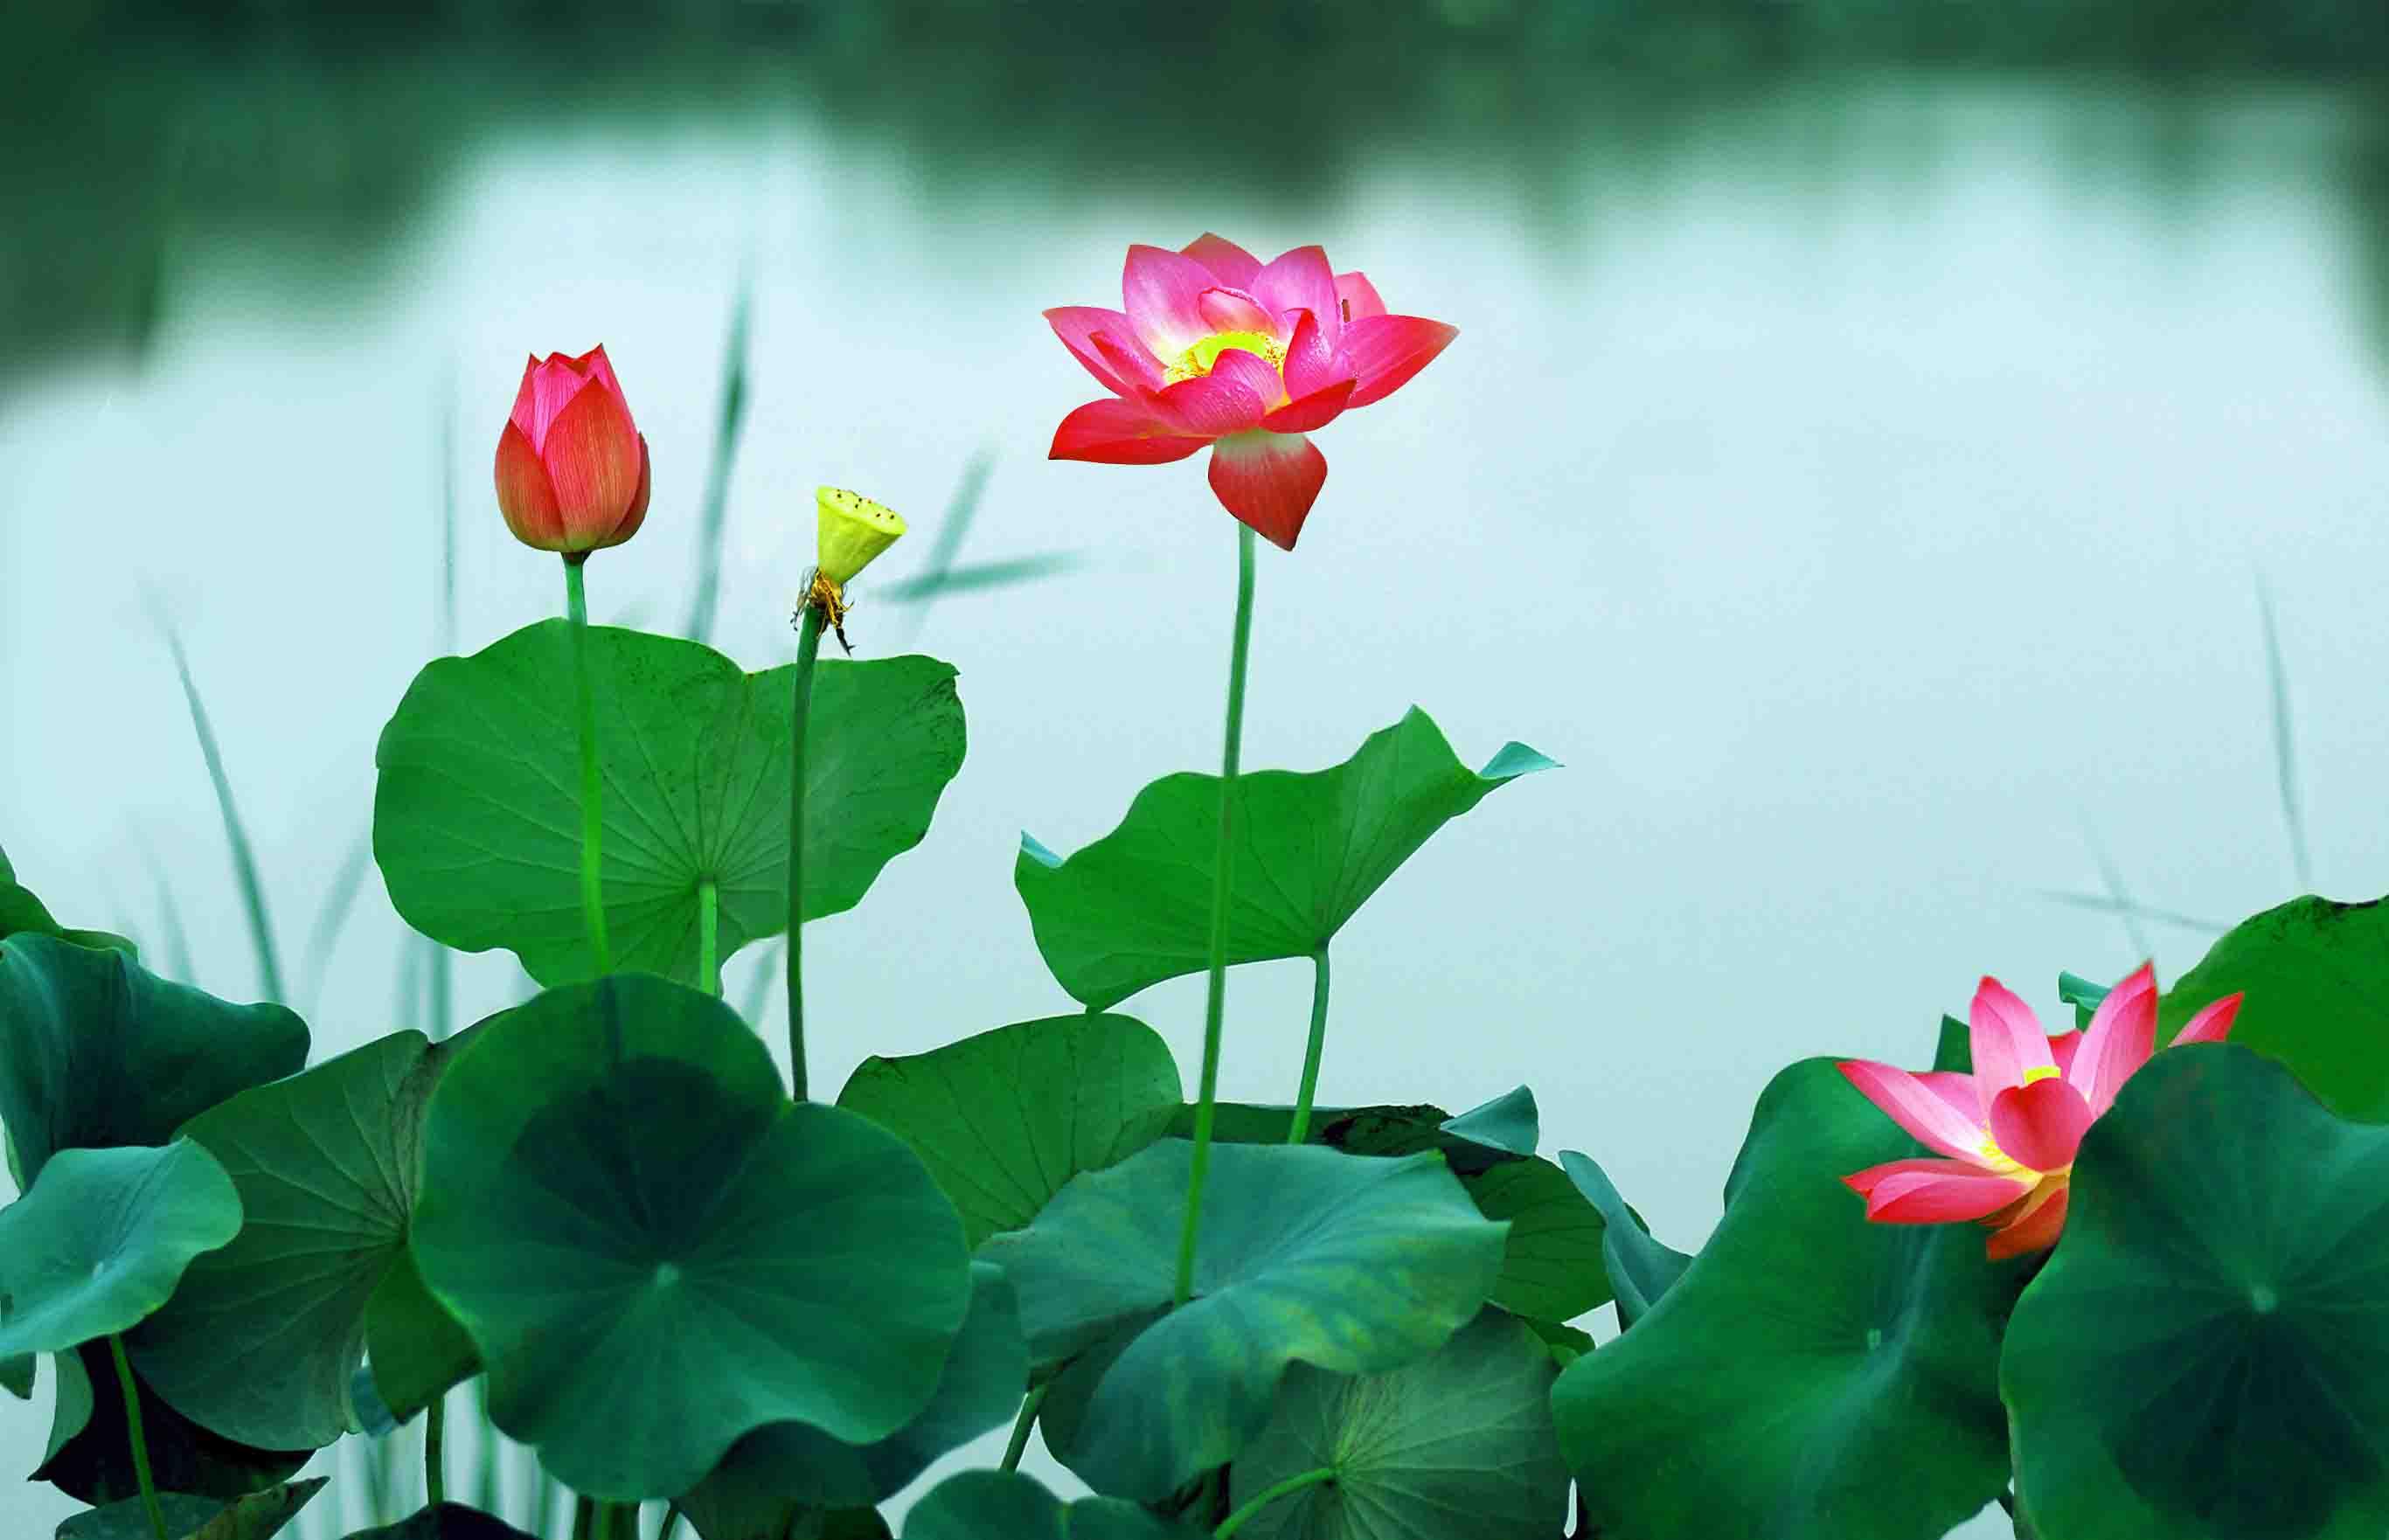 hoa sen than duoc tre hoa da cua phu nu viet_1